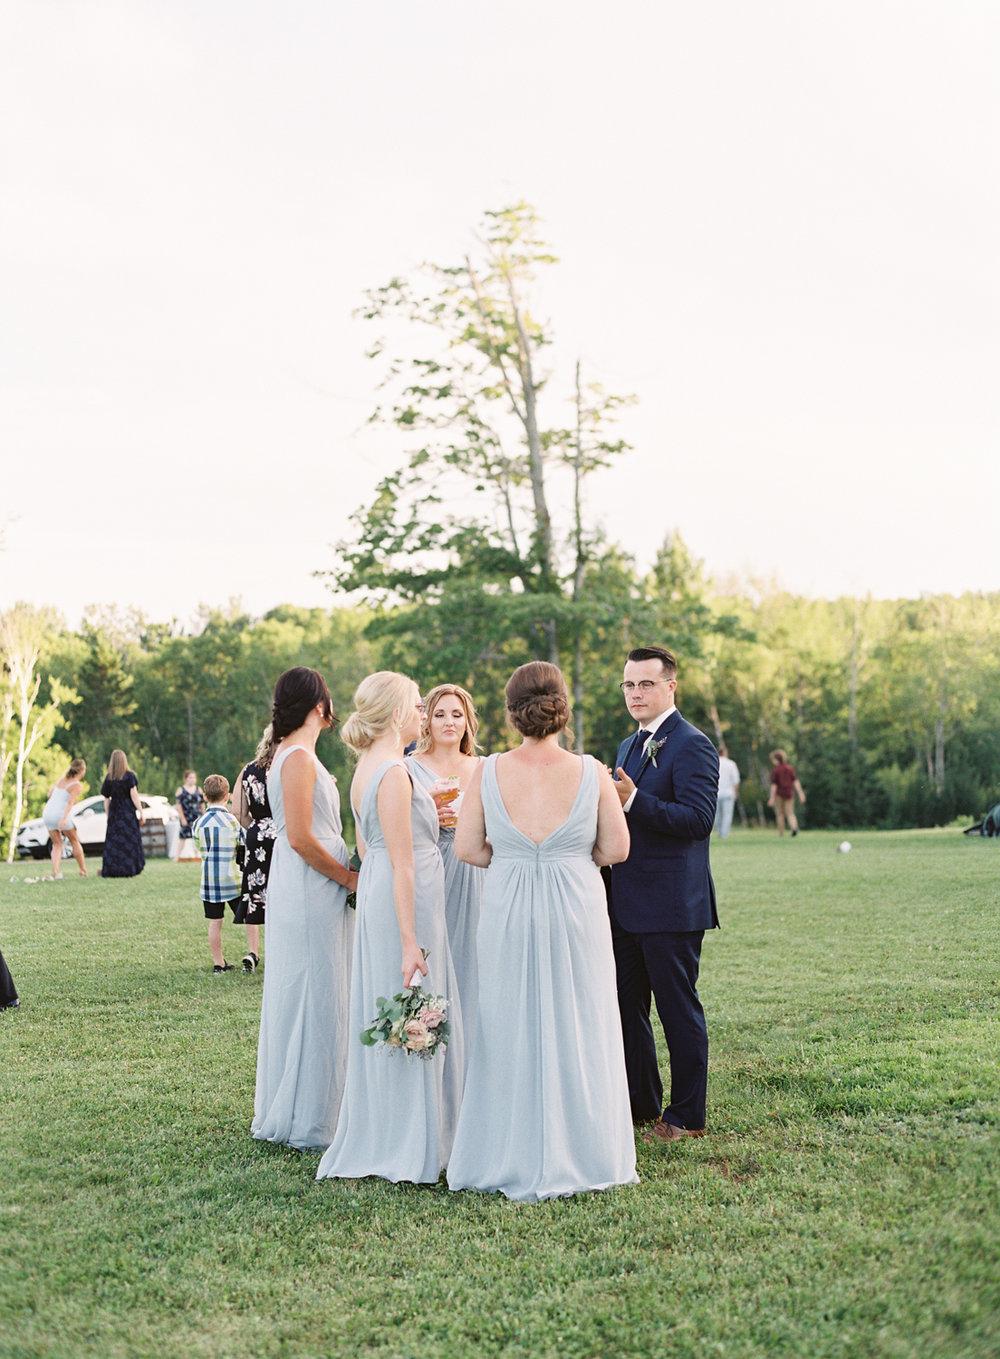 Jacqueline Anne Photography - Nova Scotia Backyard Wedding-51.jpg